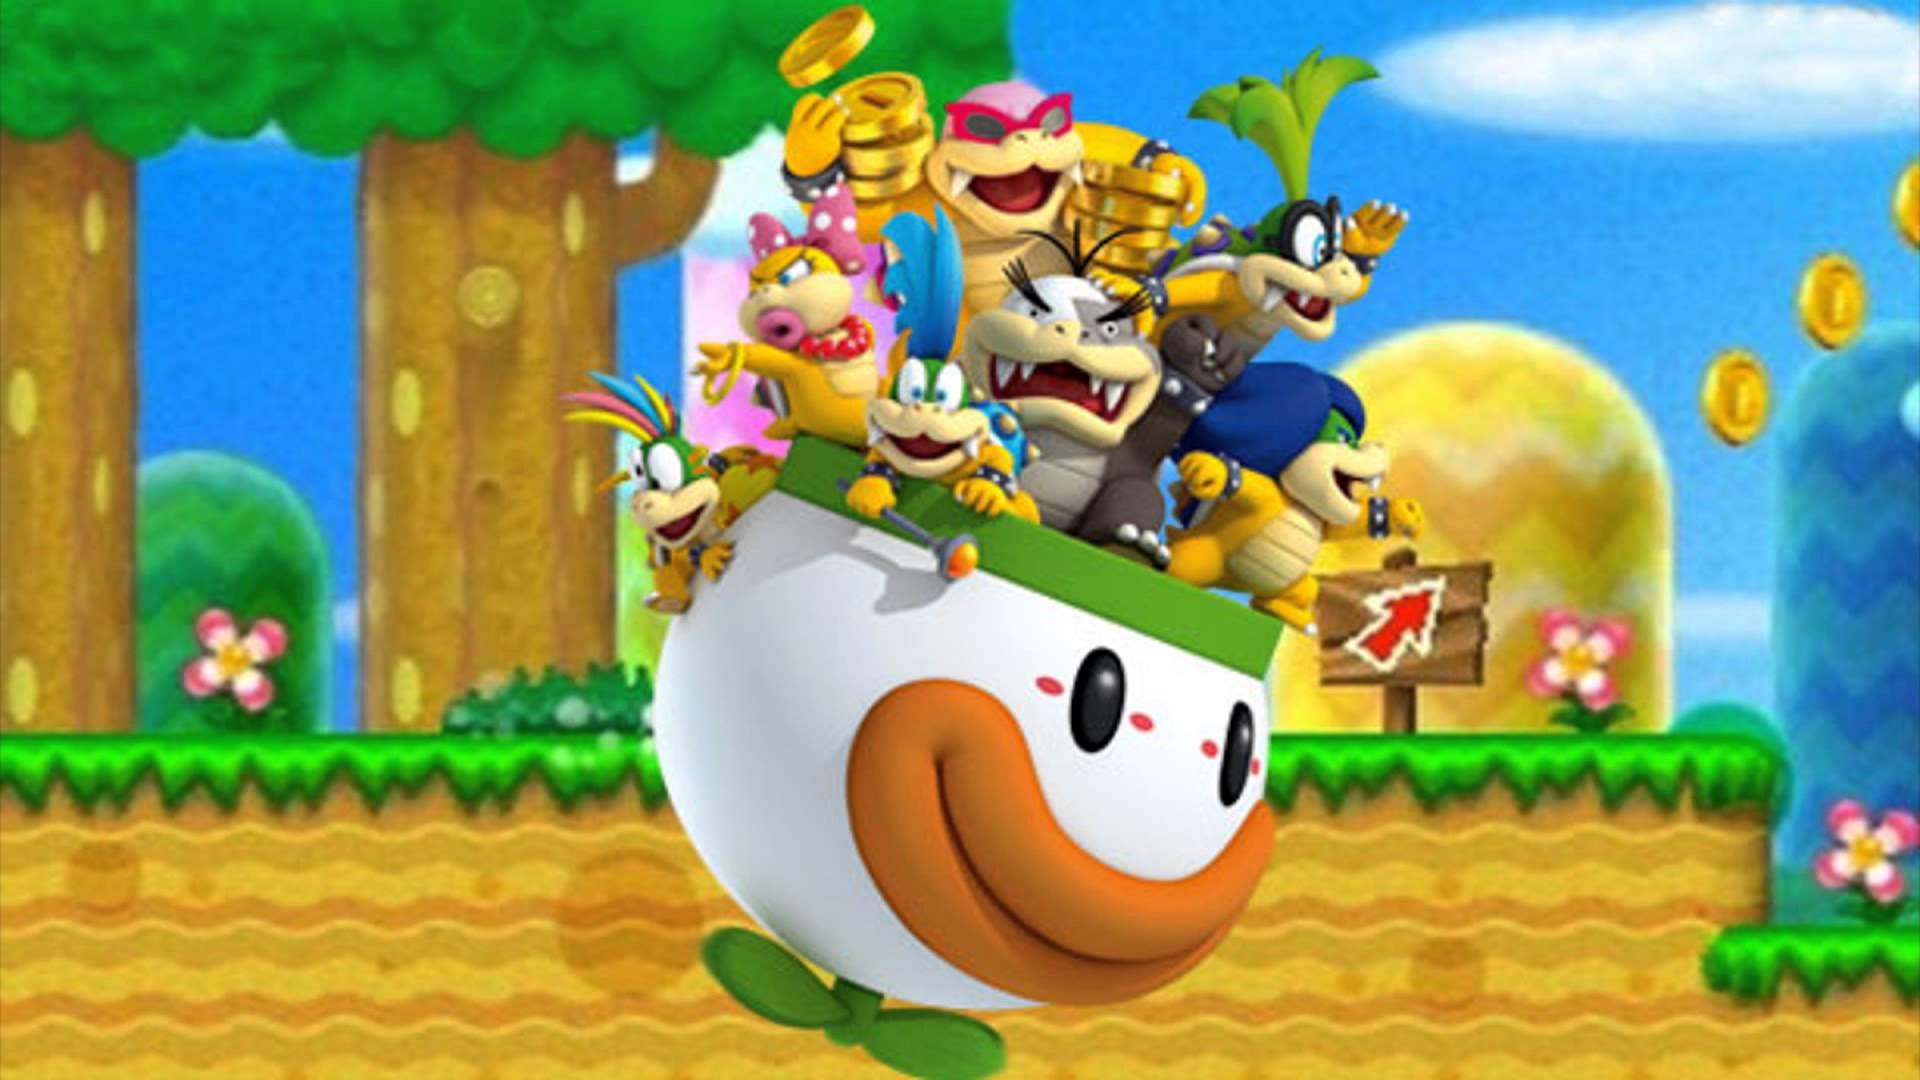 New Super Mario Bros 2 Wallpapers - Top Free New Super Mario